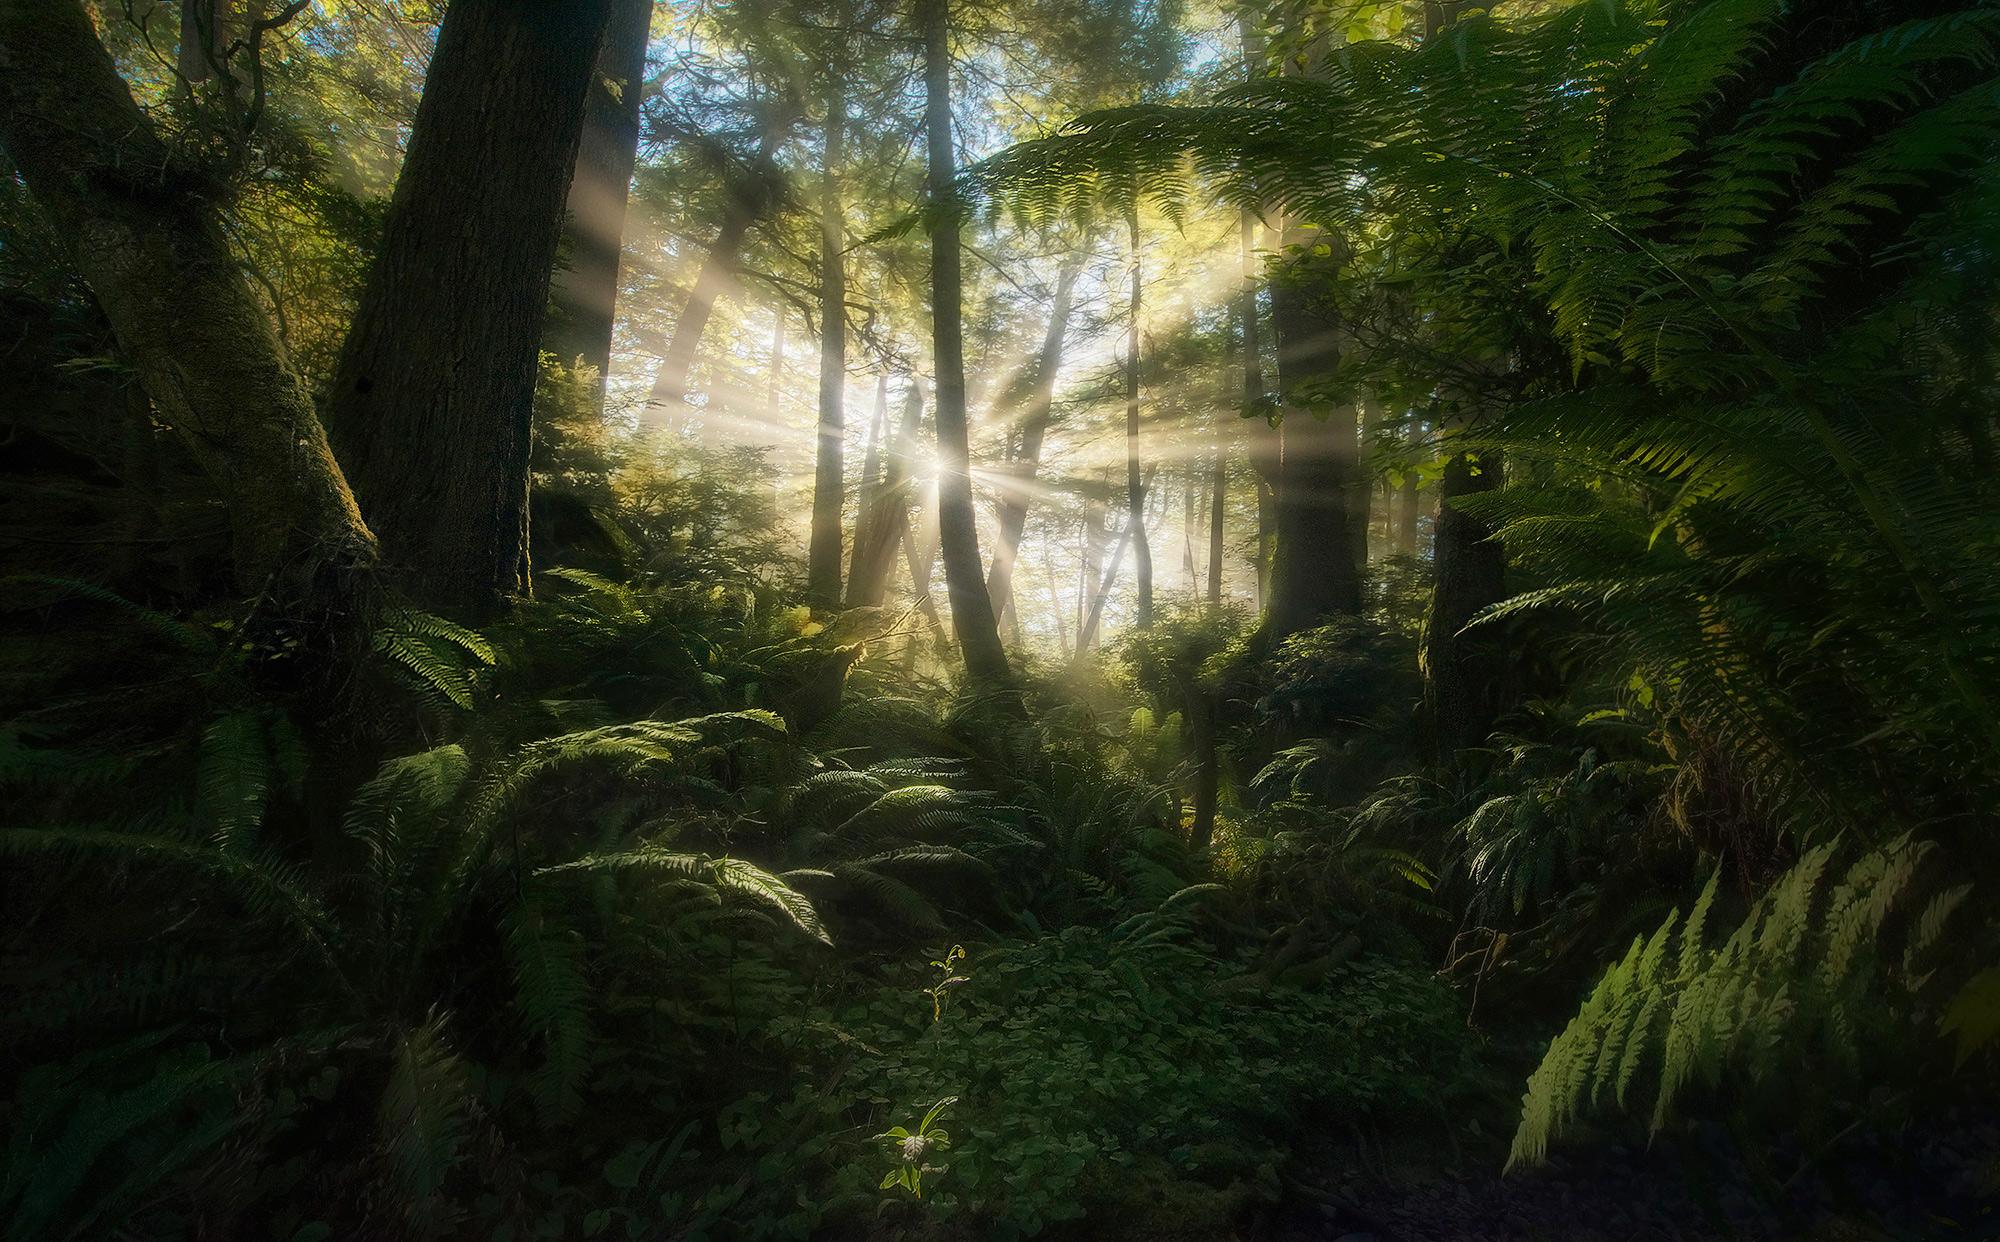 Olympic, Rainforest,washington, quinault,beams,sunbeam,rays,ferns,fern, photo